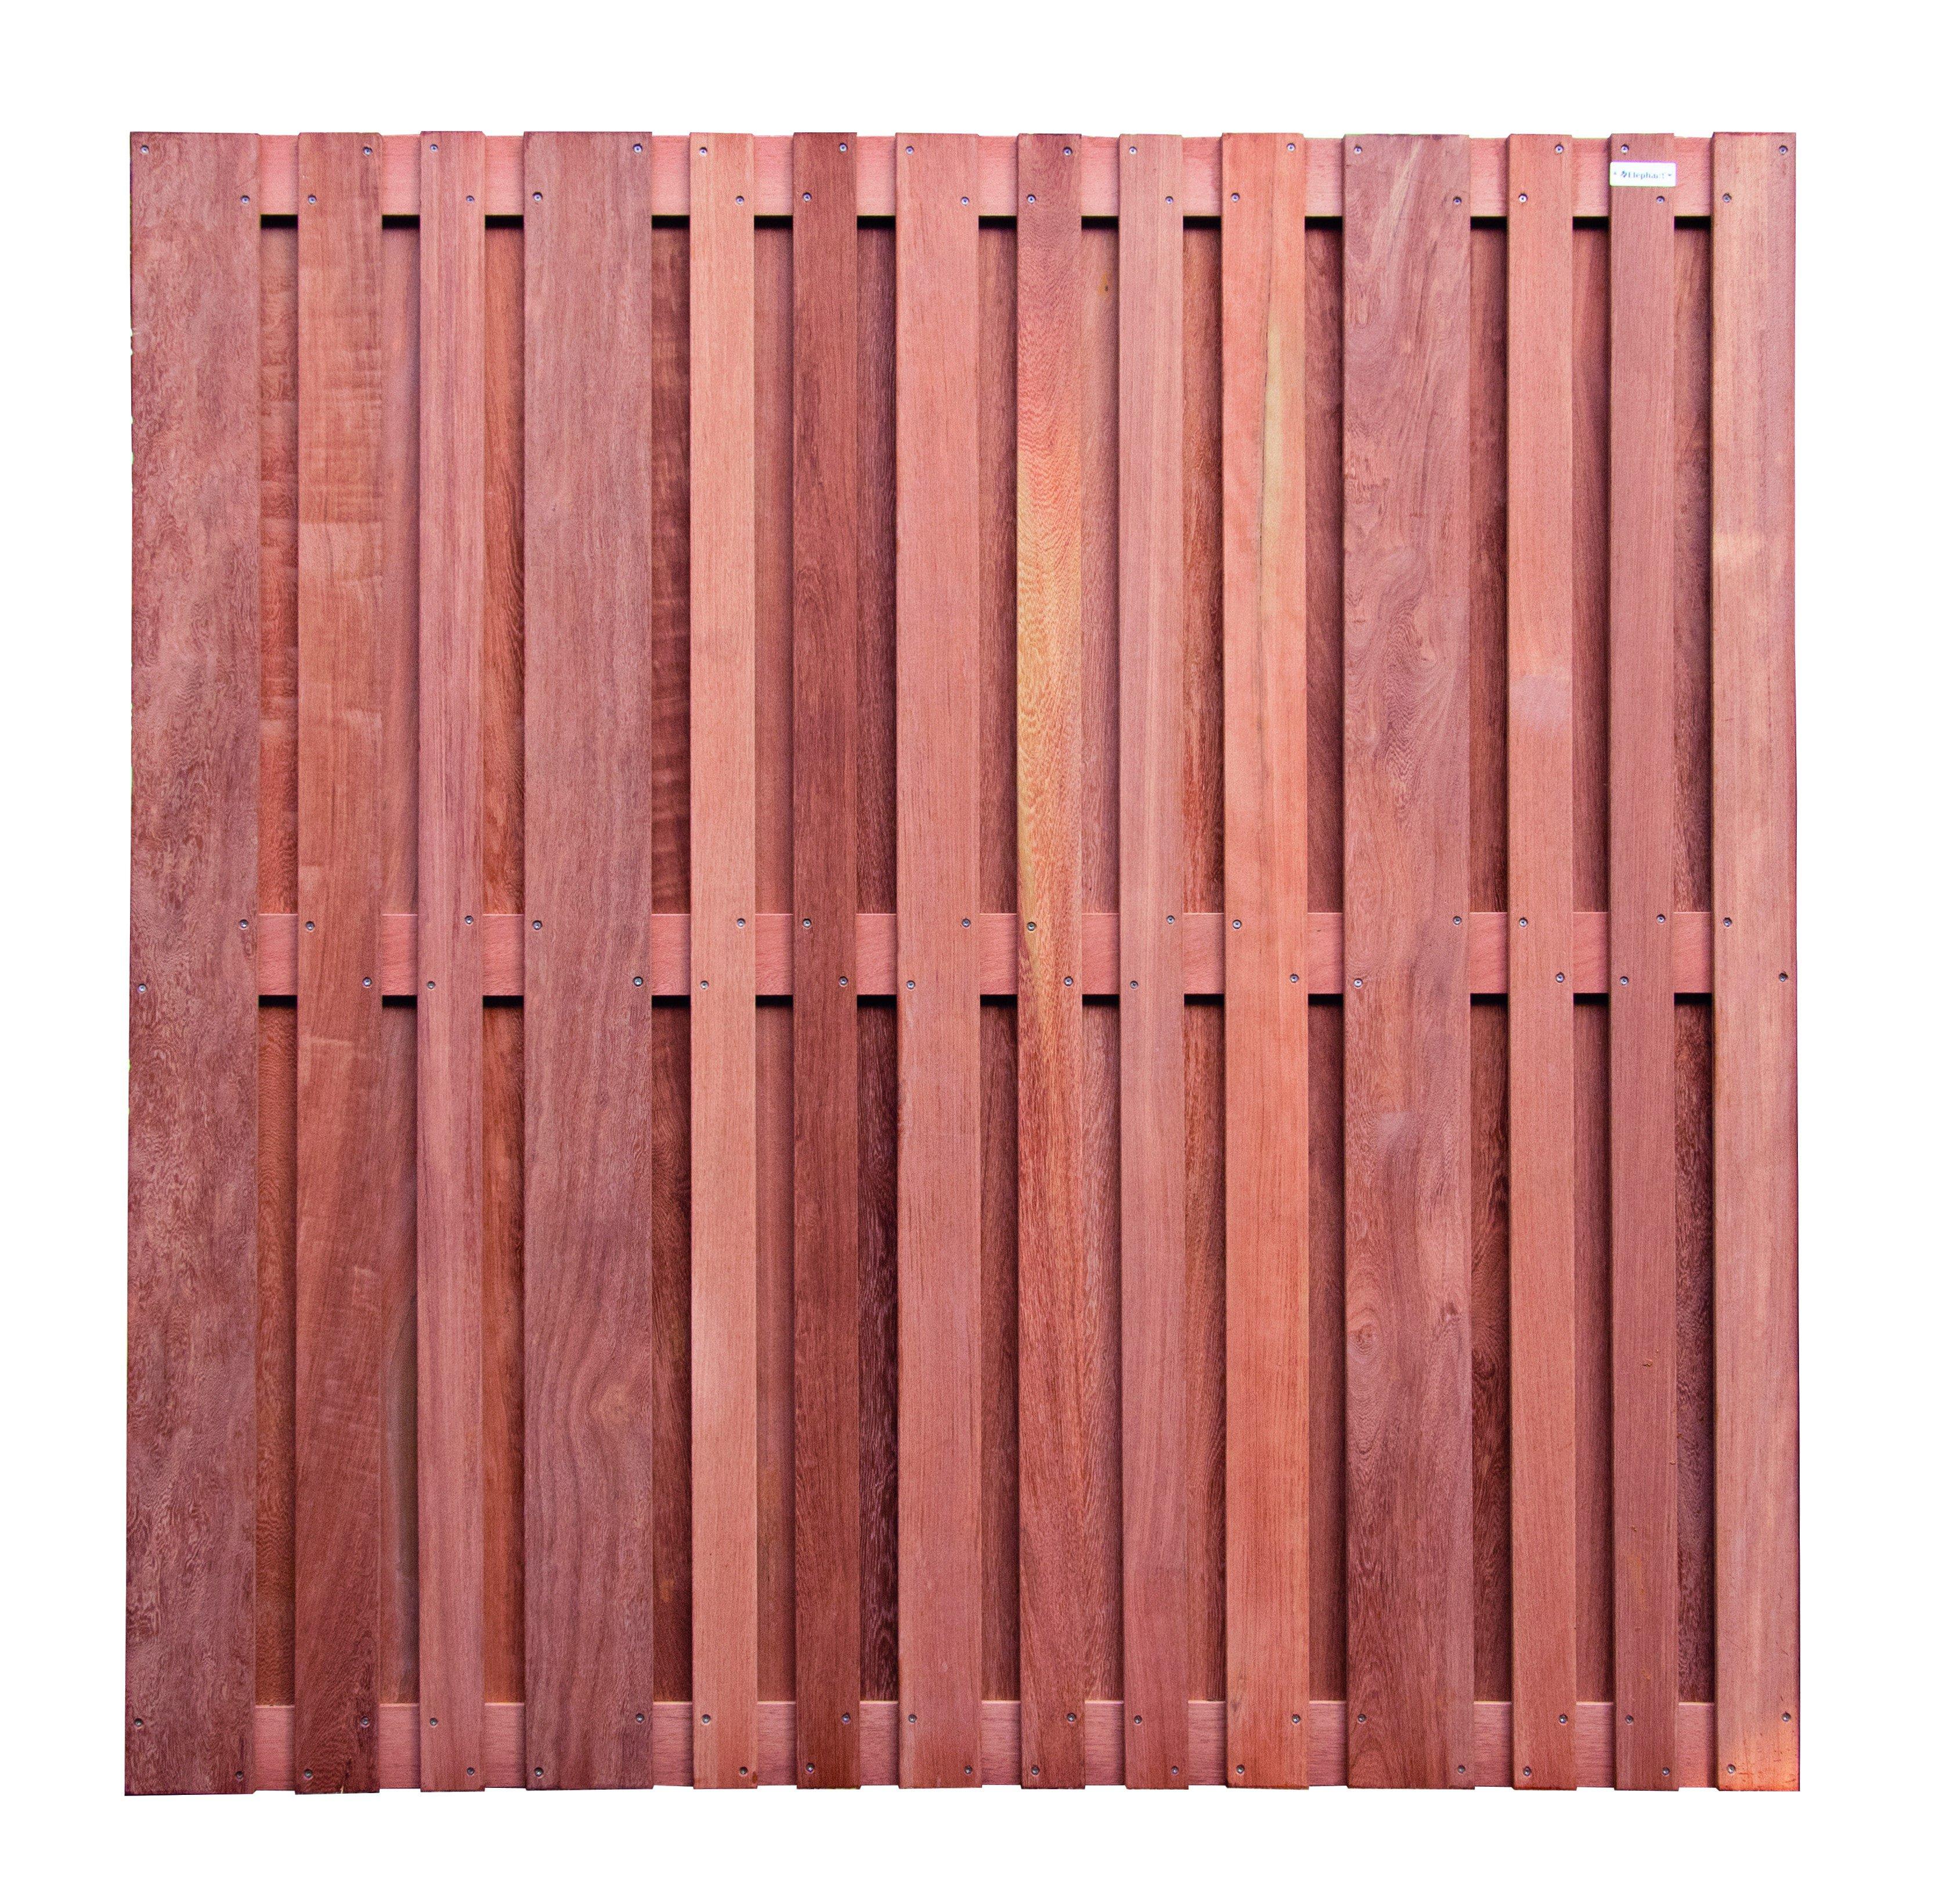 Hardhouten schutting Cedrinho 180 x 180 cm. Type: Stripes